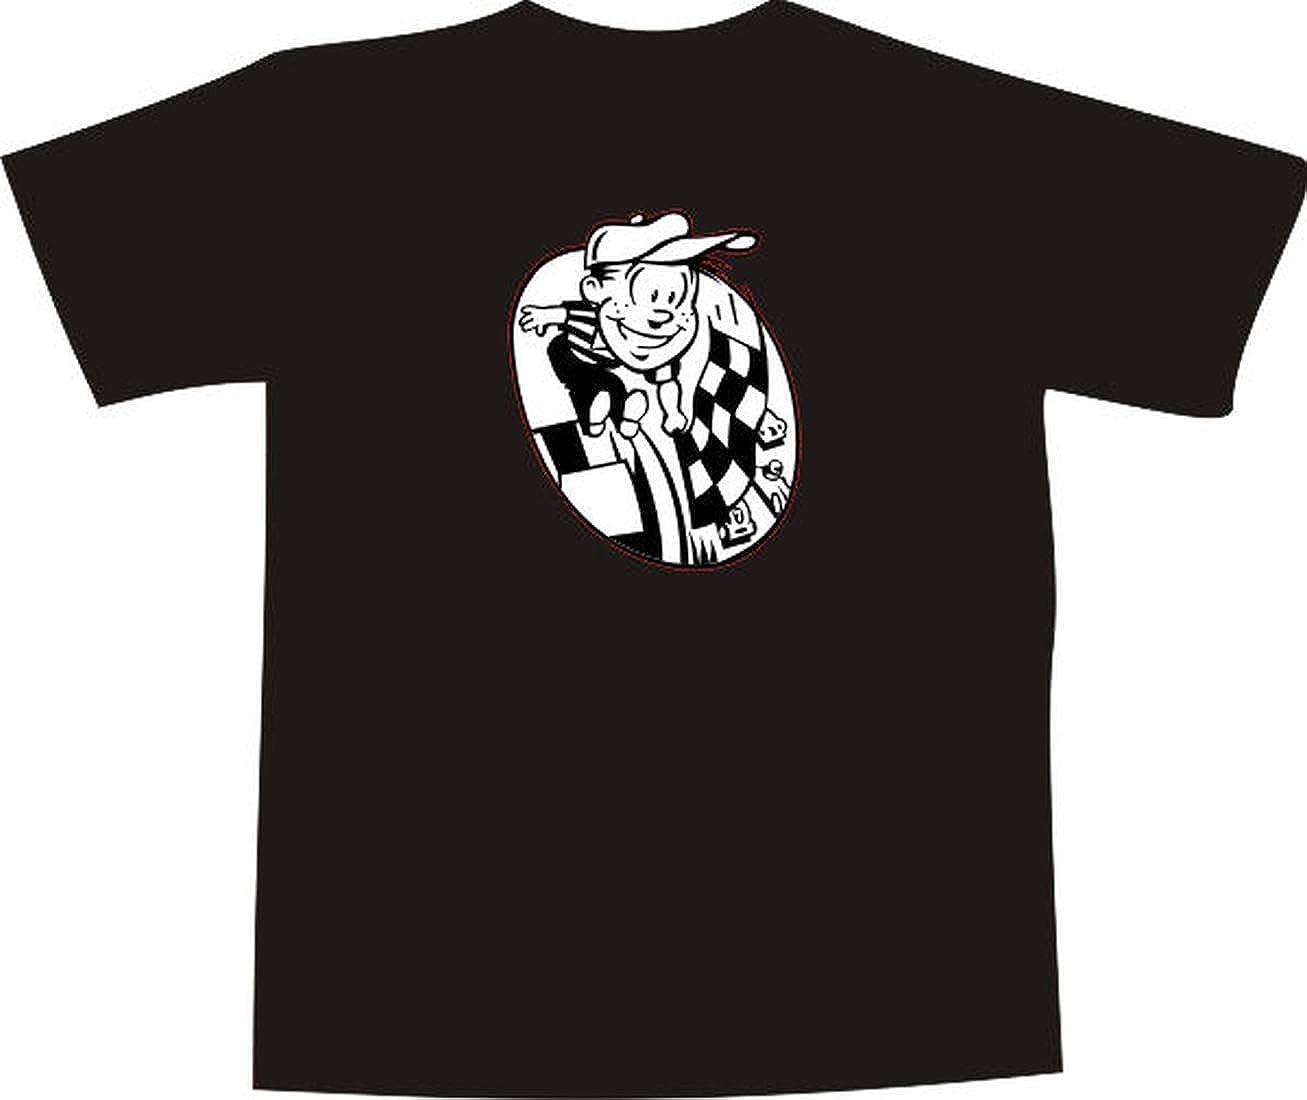 Black Dragon - T-Shirt E1222 - Logo/Grafik/Design - Finish - Ziel ...